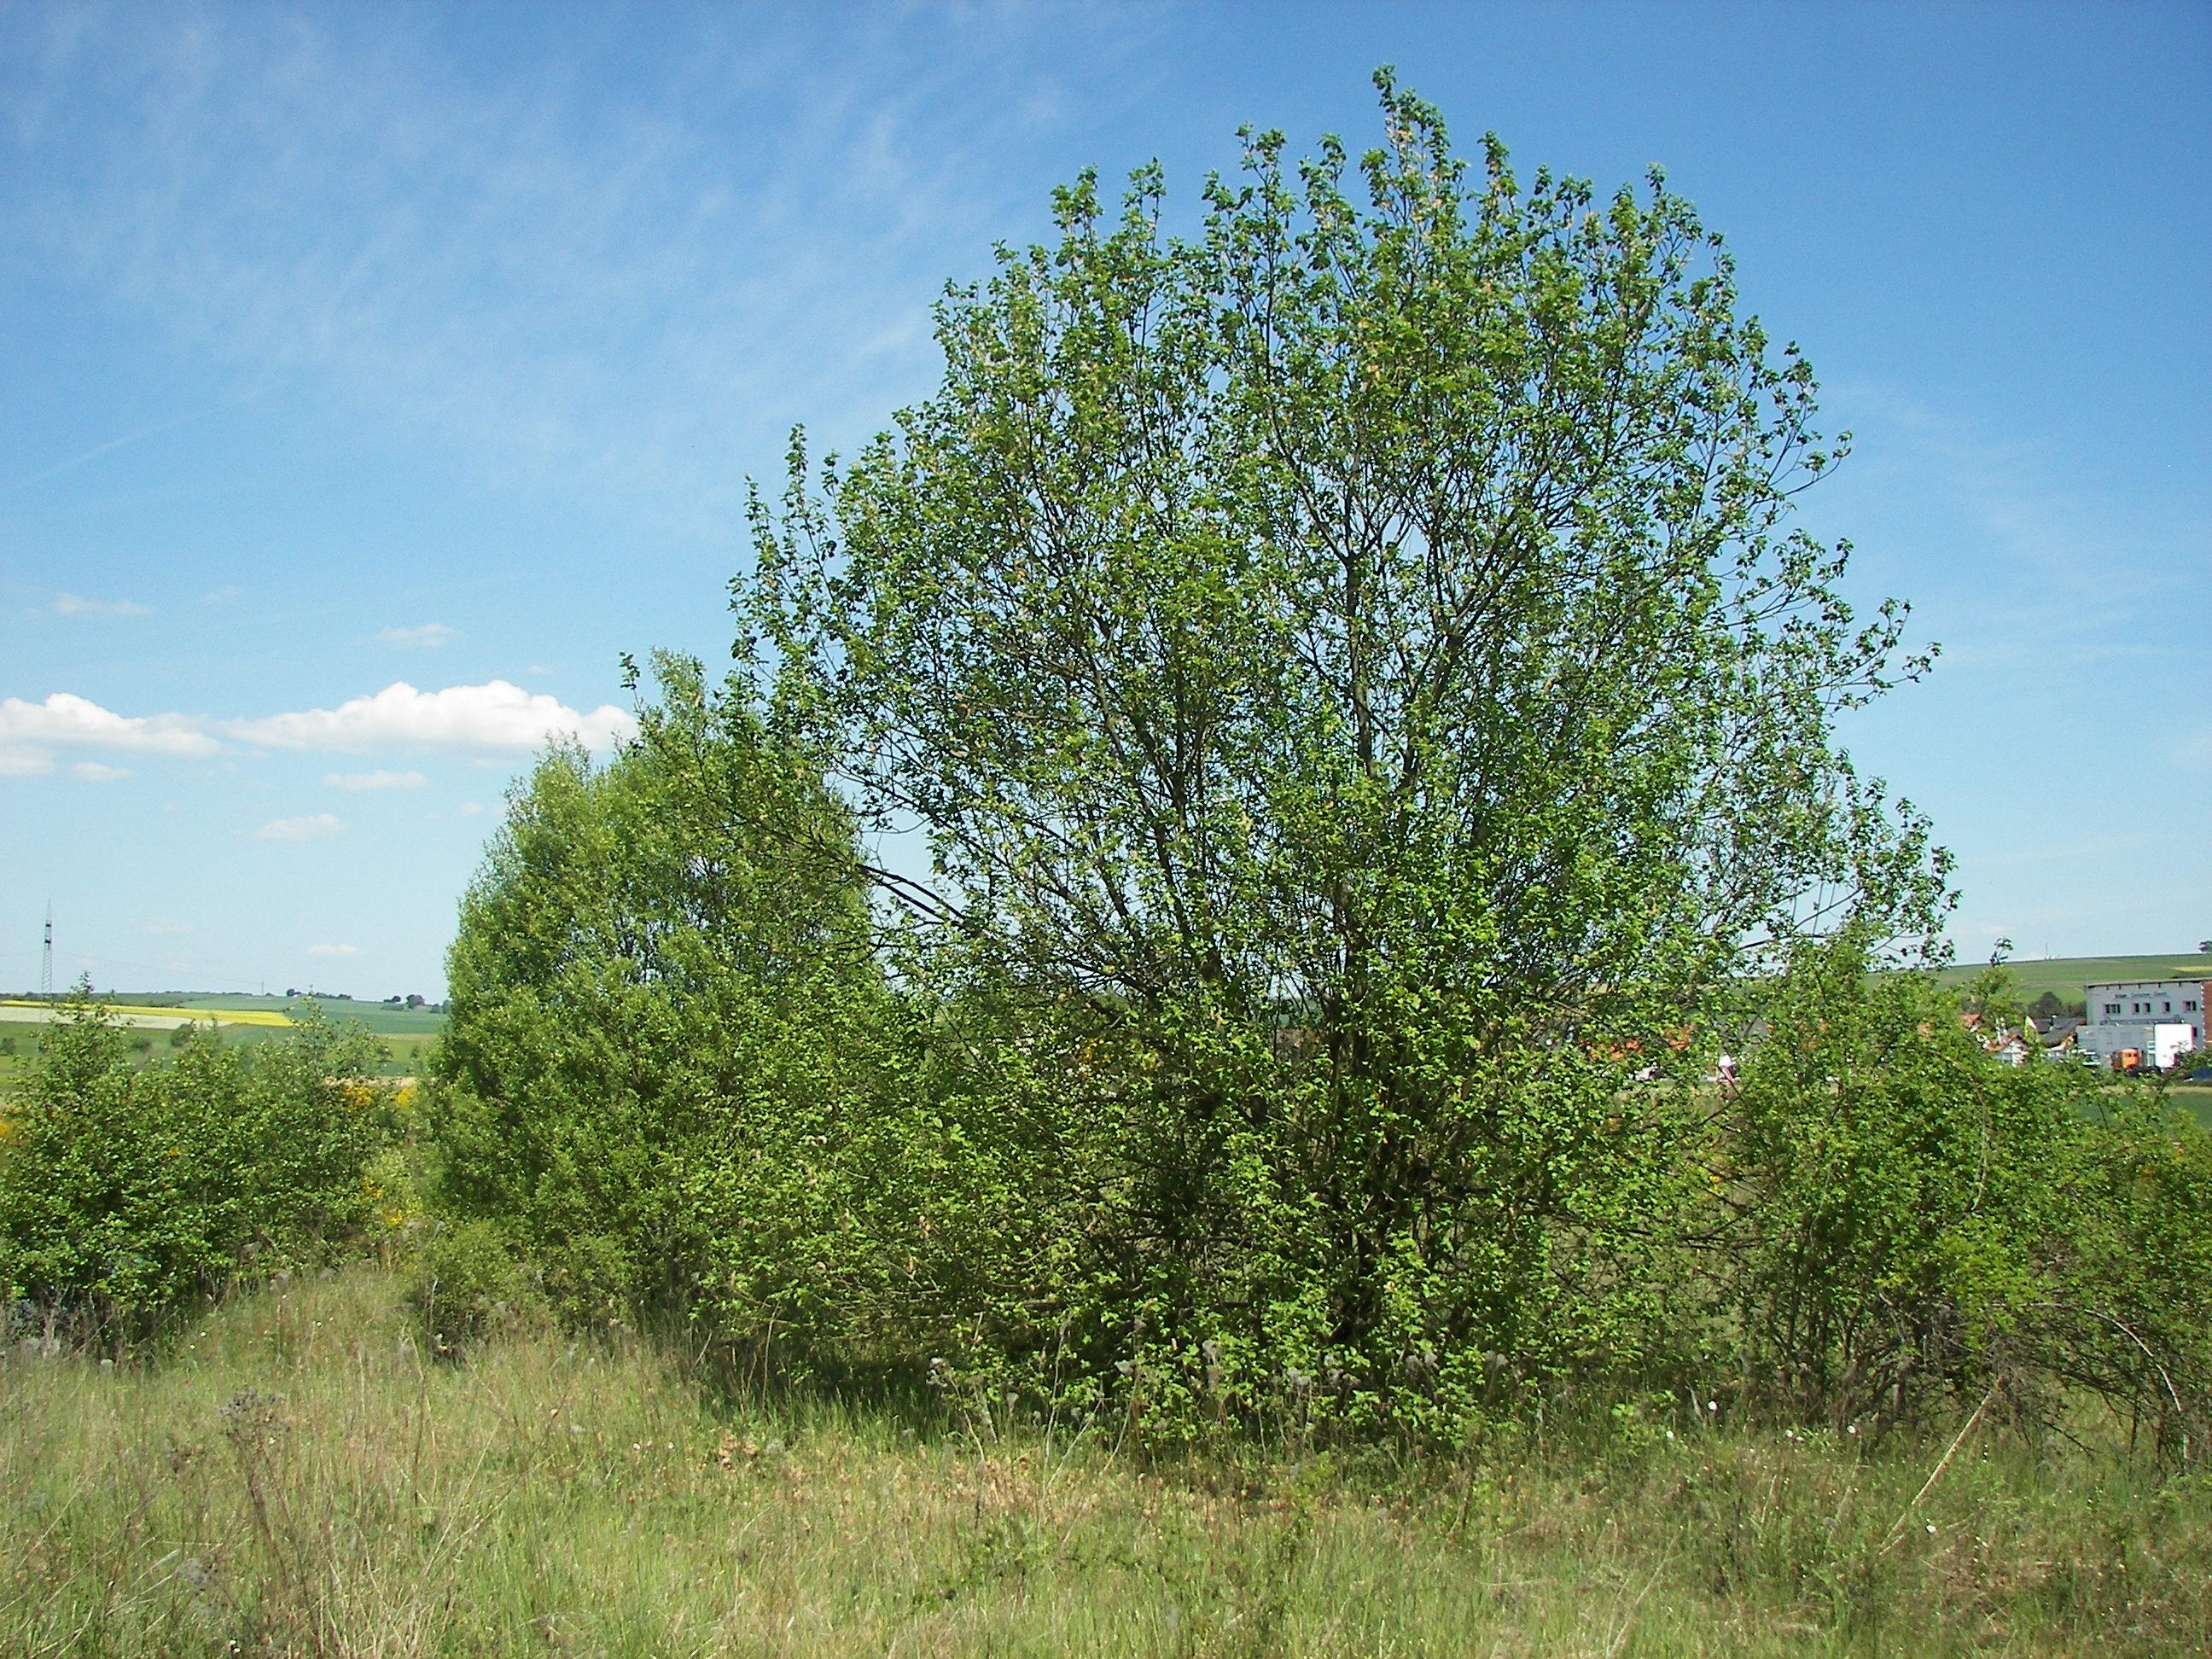 File:Salix caprea 033.jpg - Wikimedia Commons